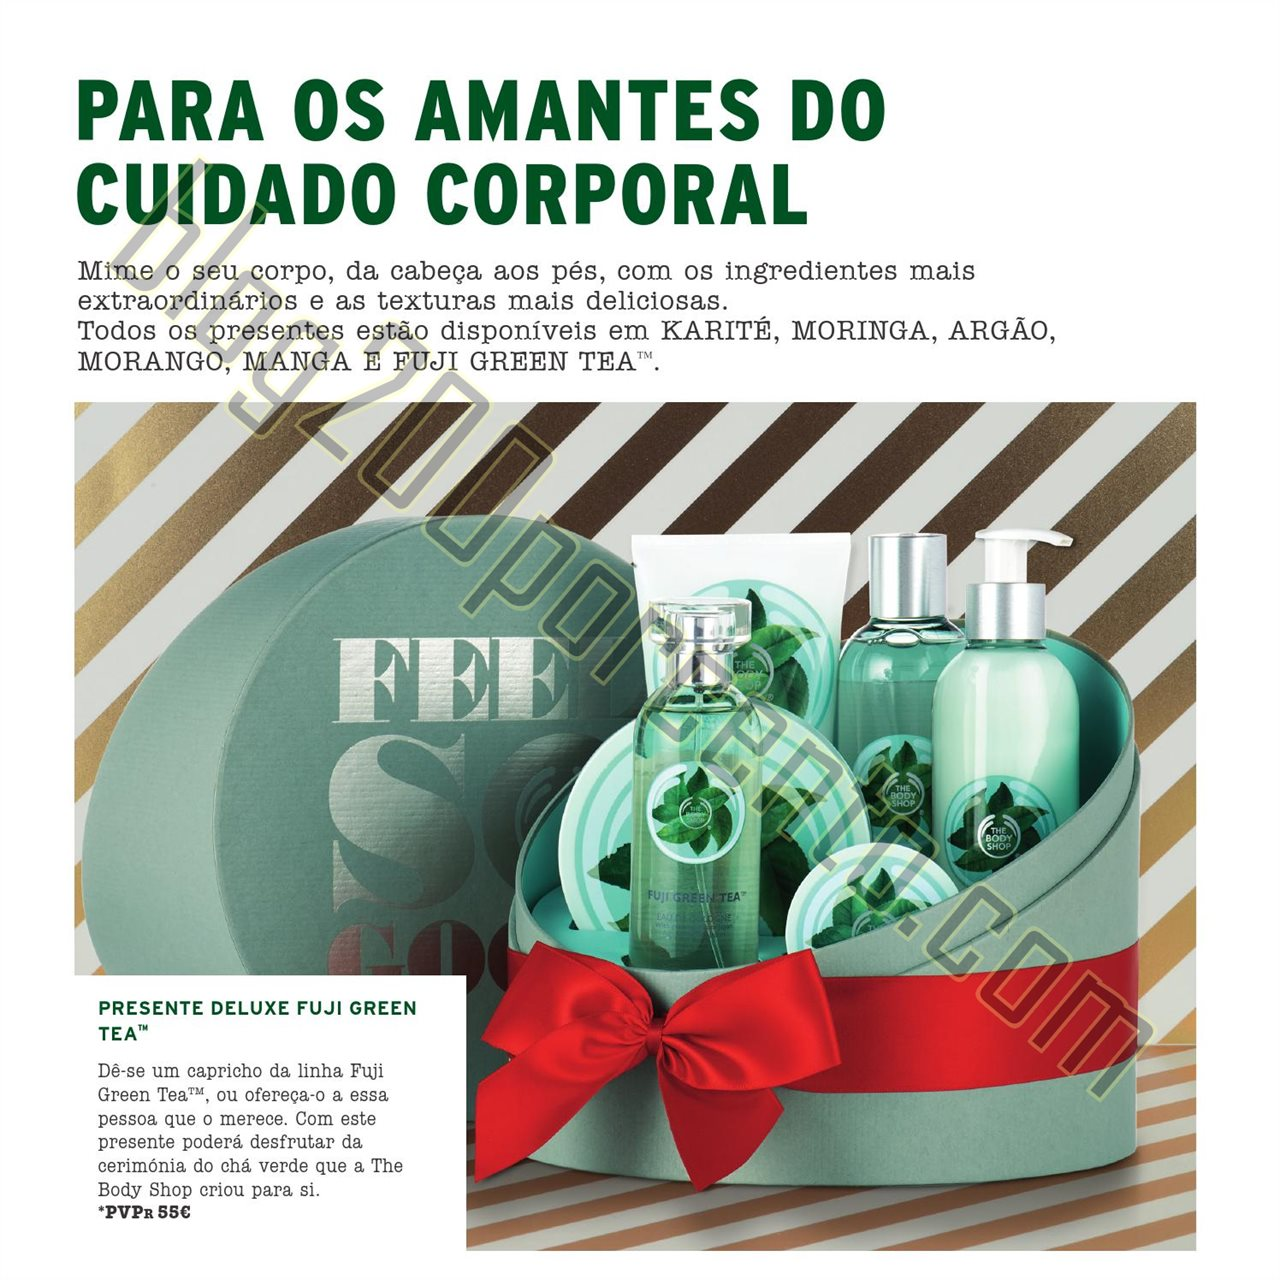 Novo Folheto THE BODY SHOP Natal 2015 p8.jpg